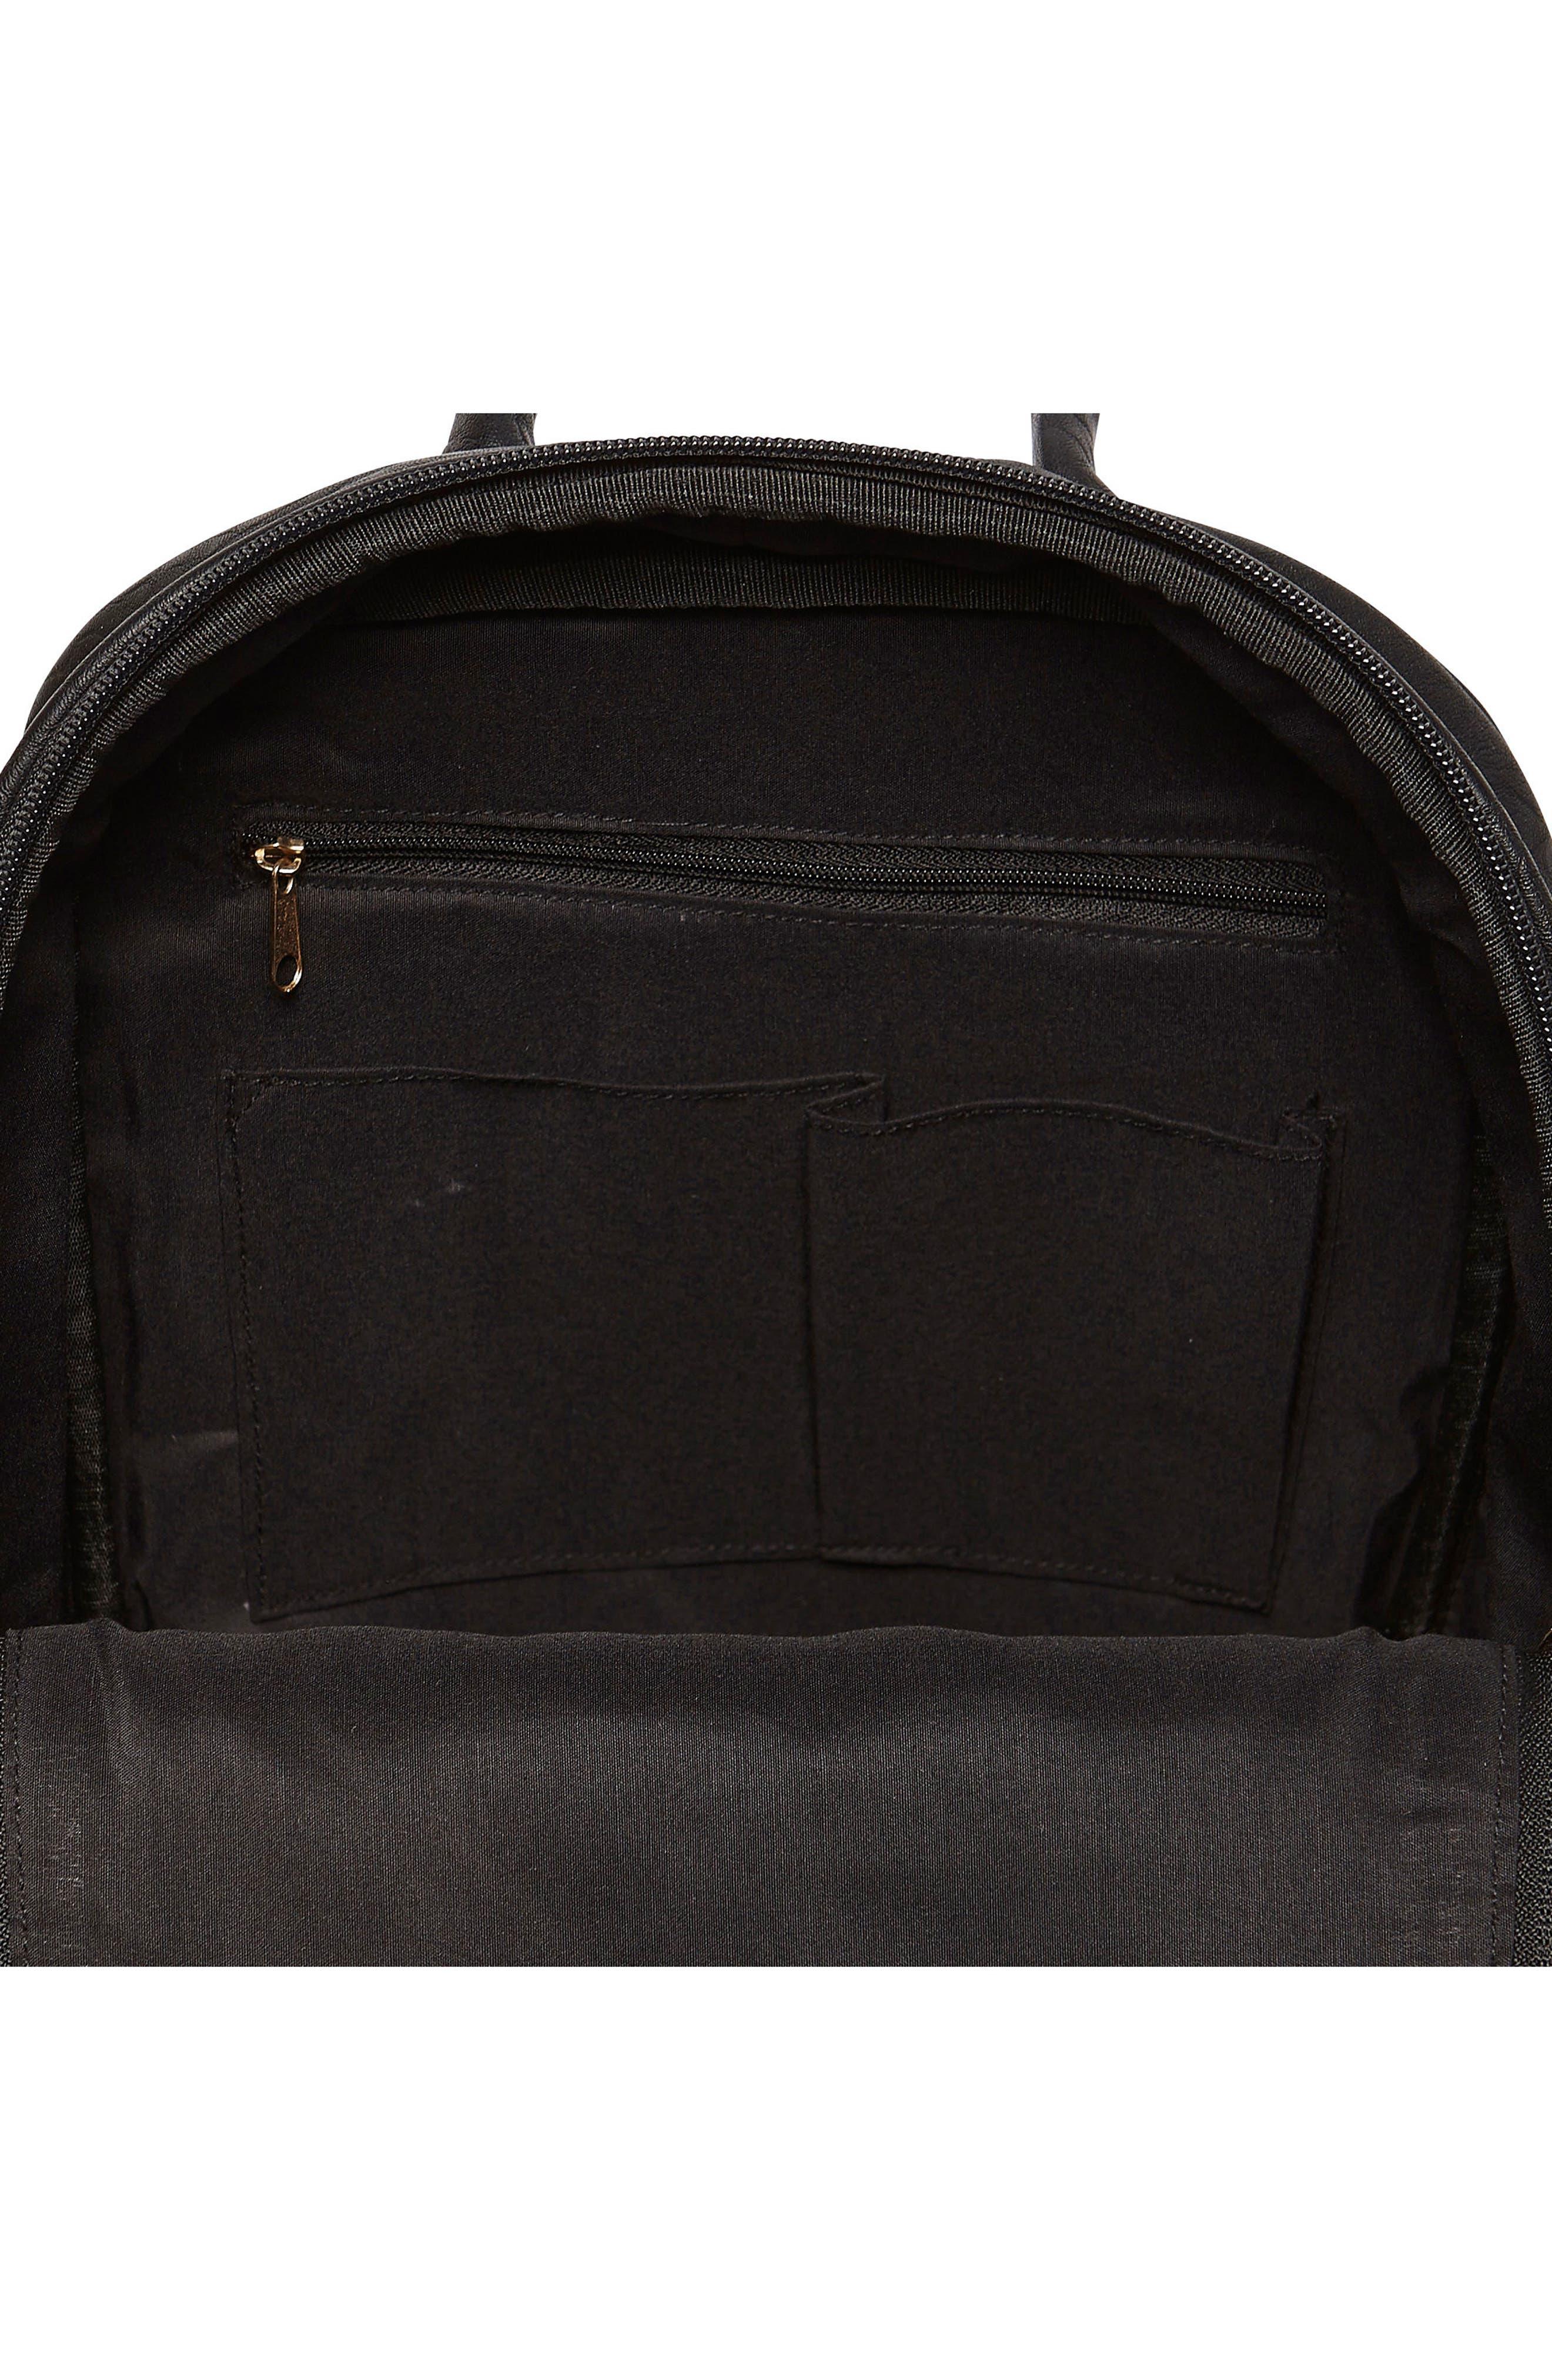 My Way Vegan Leather Backpack,                             Alternate thumbnail 3, color,                             BLACK